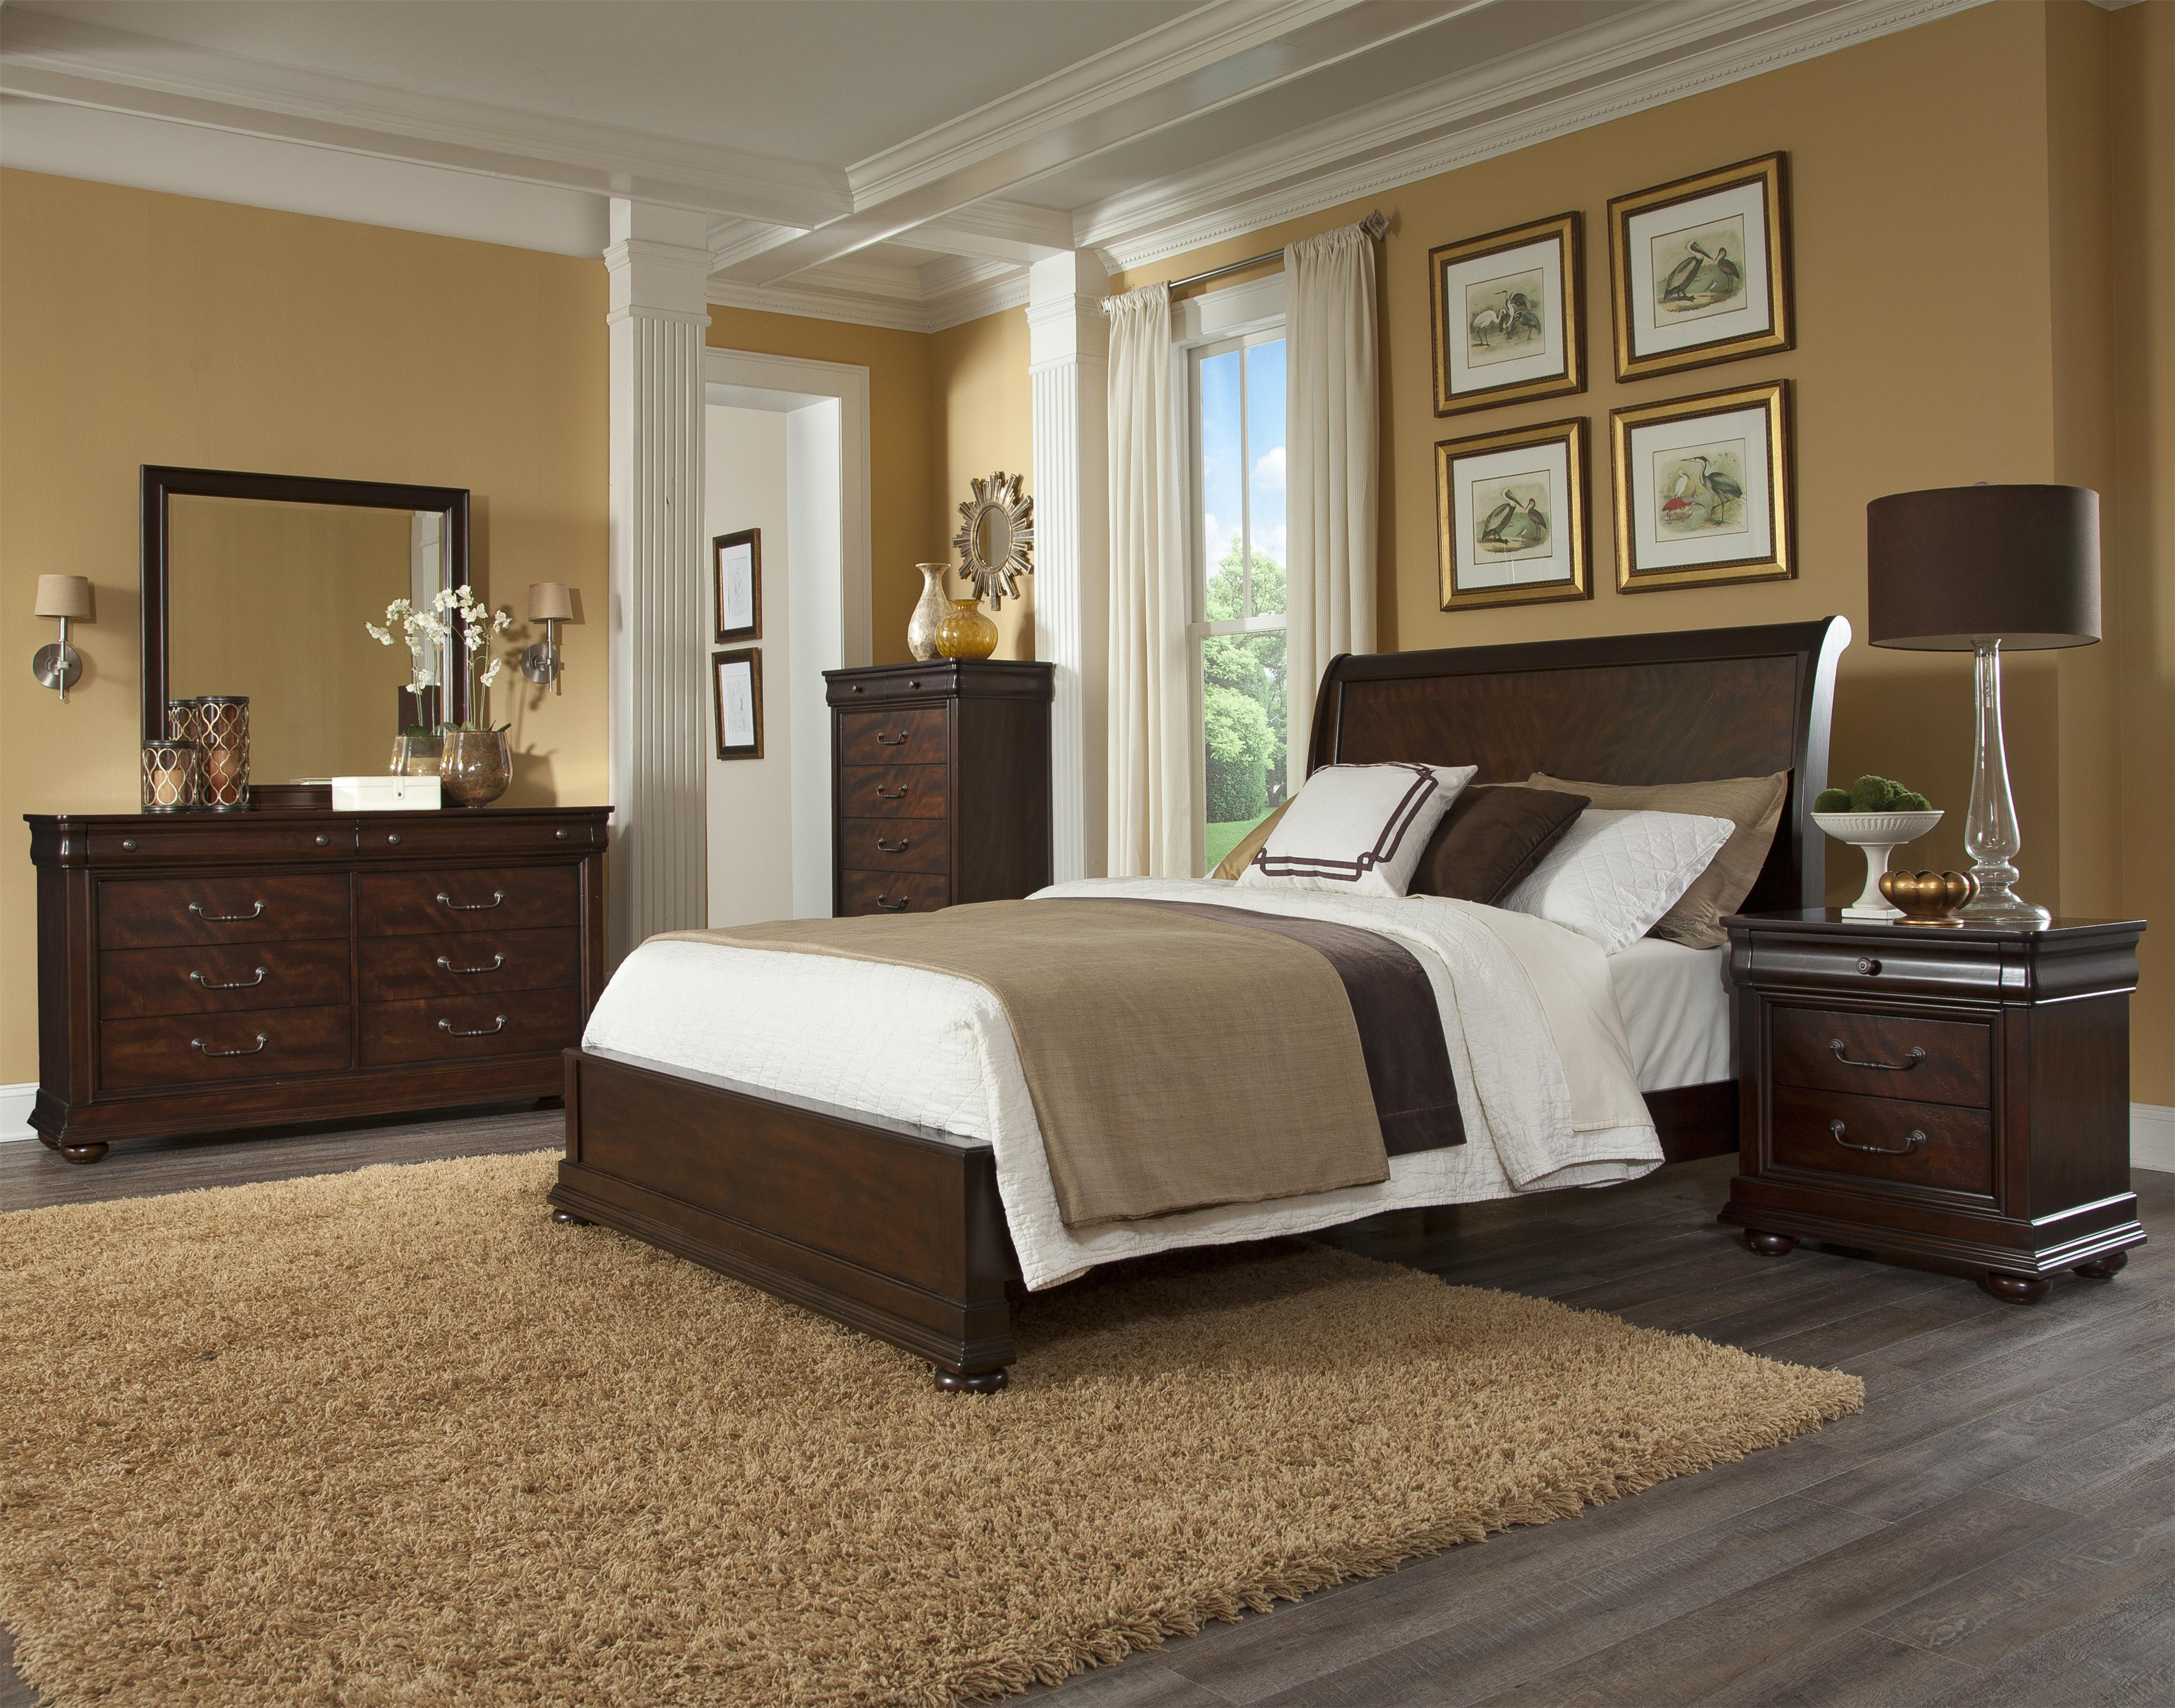 Klaussner International Parkview Queen Bedroom Group 2 Wayside Furniture Bedroom Group